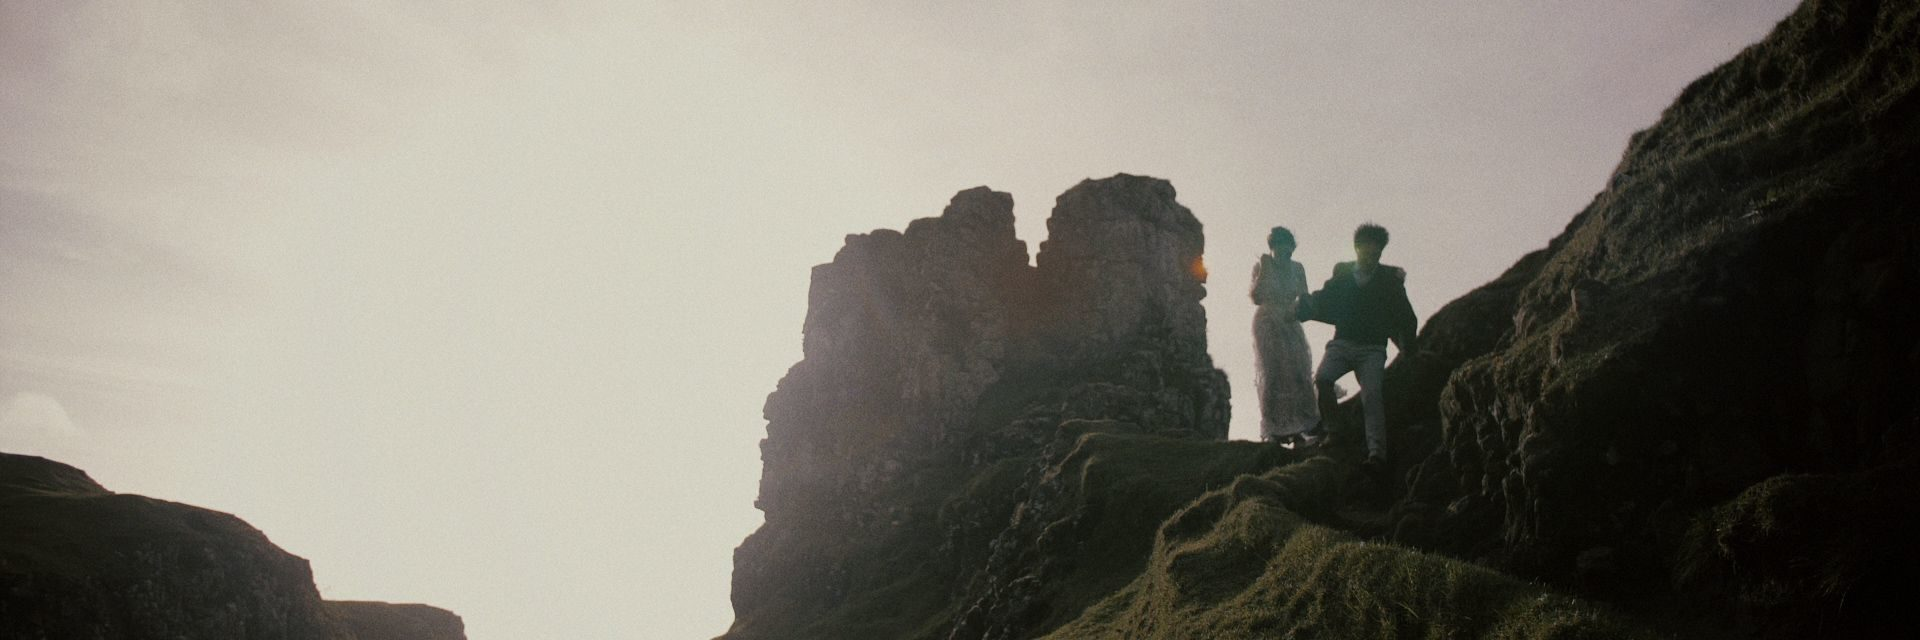 Isle of Skye-wedding-videographer-cinemate-films-04